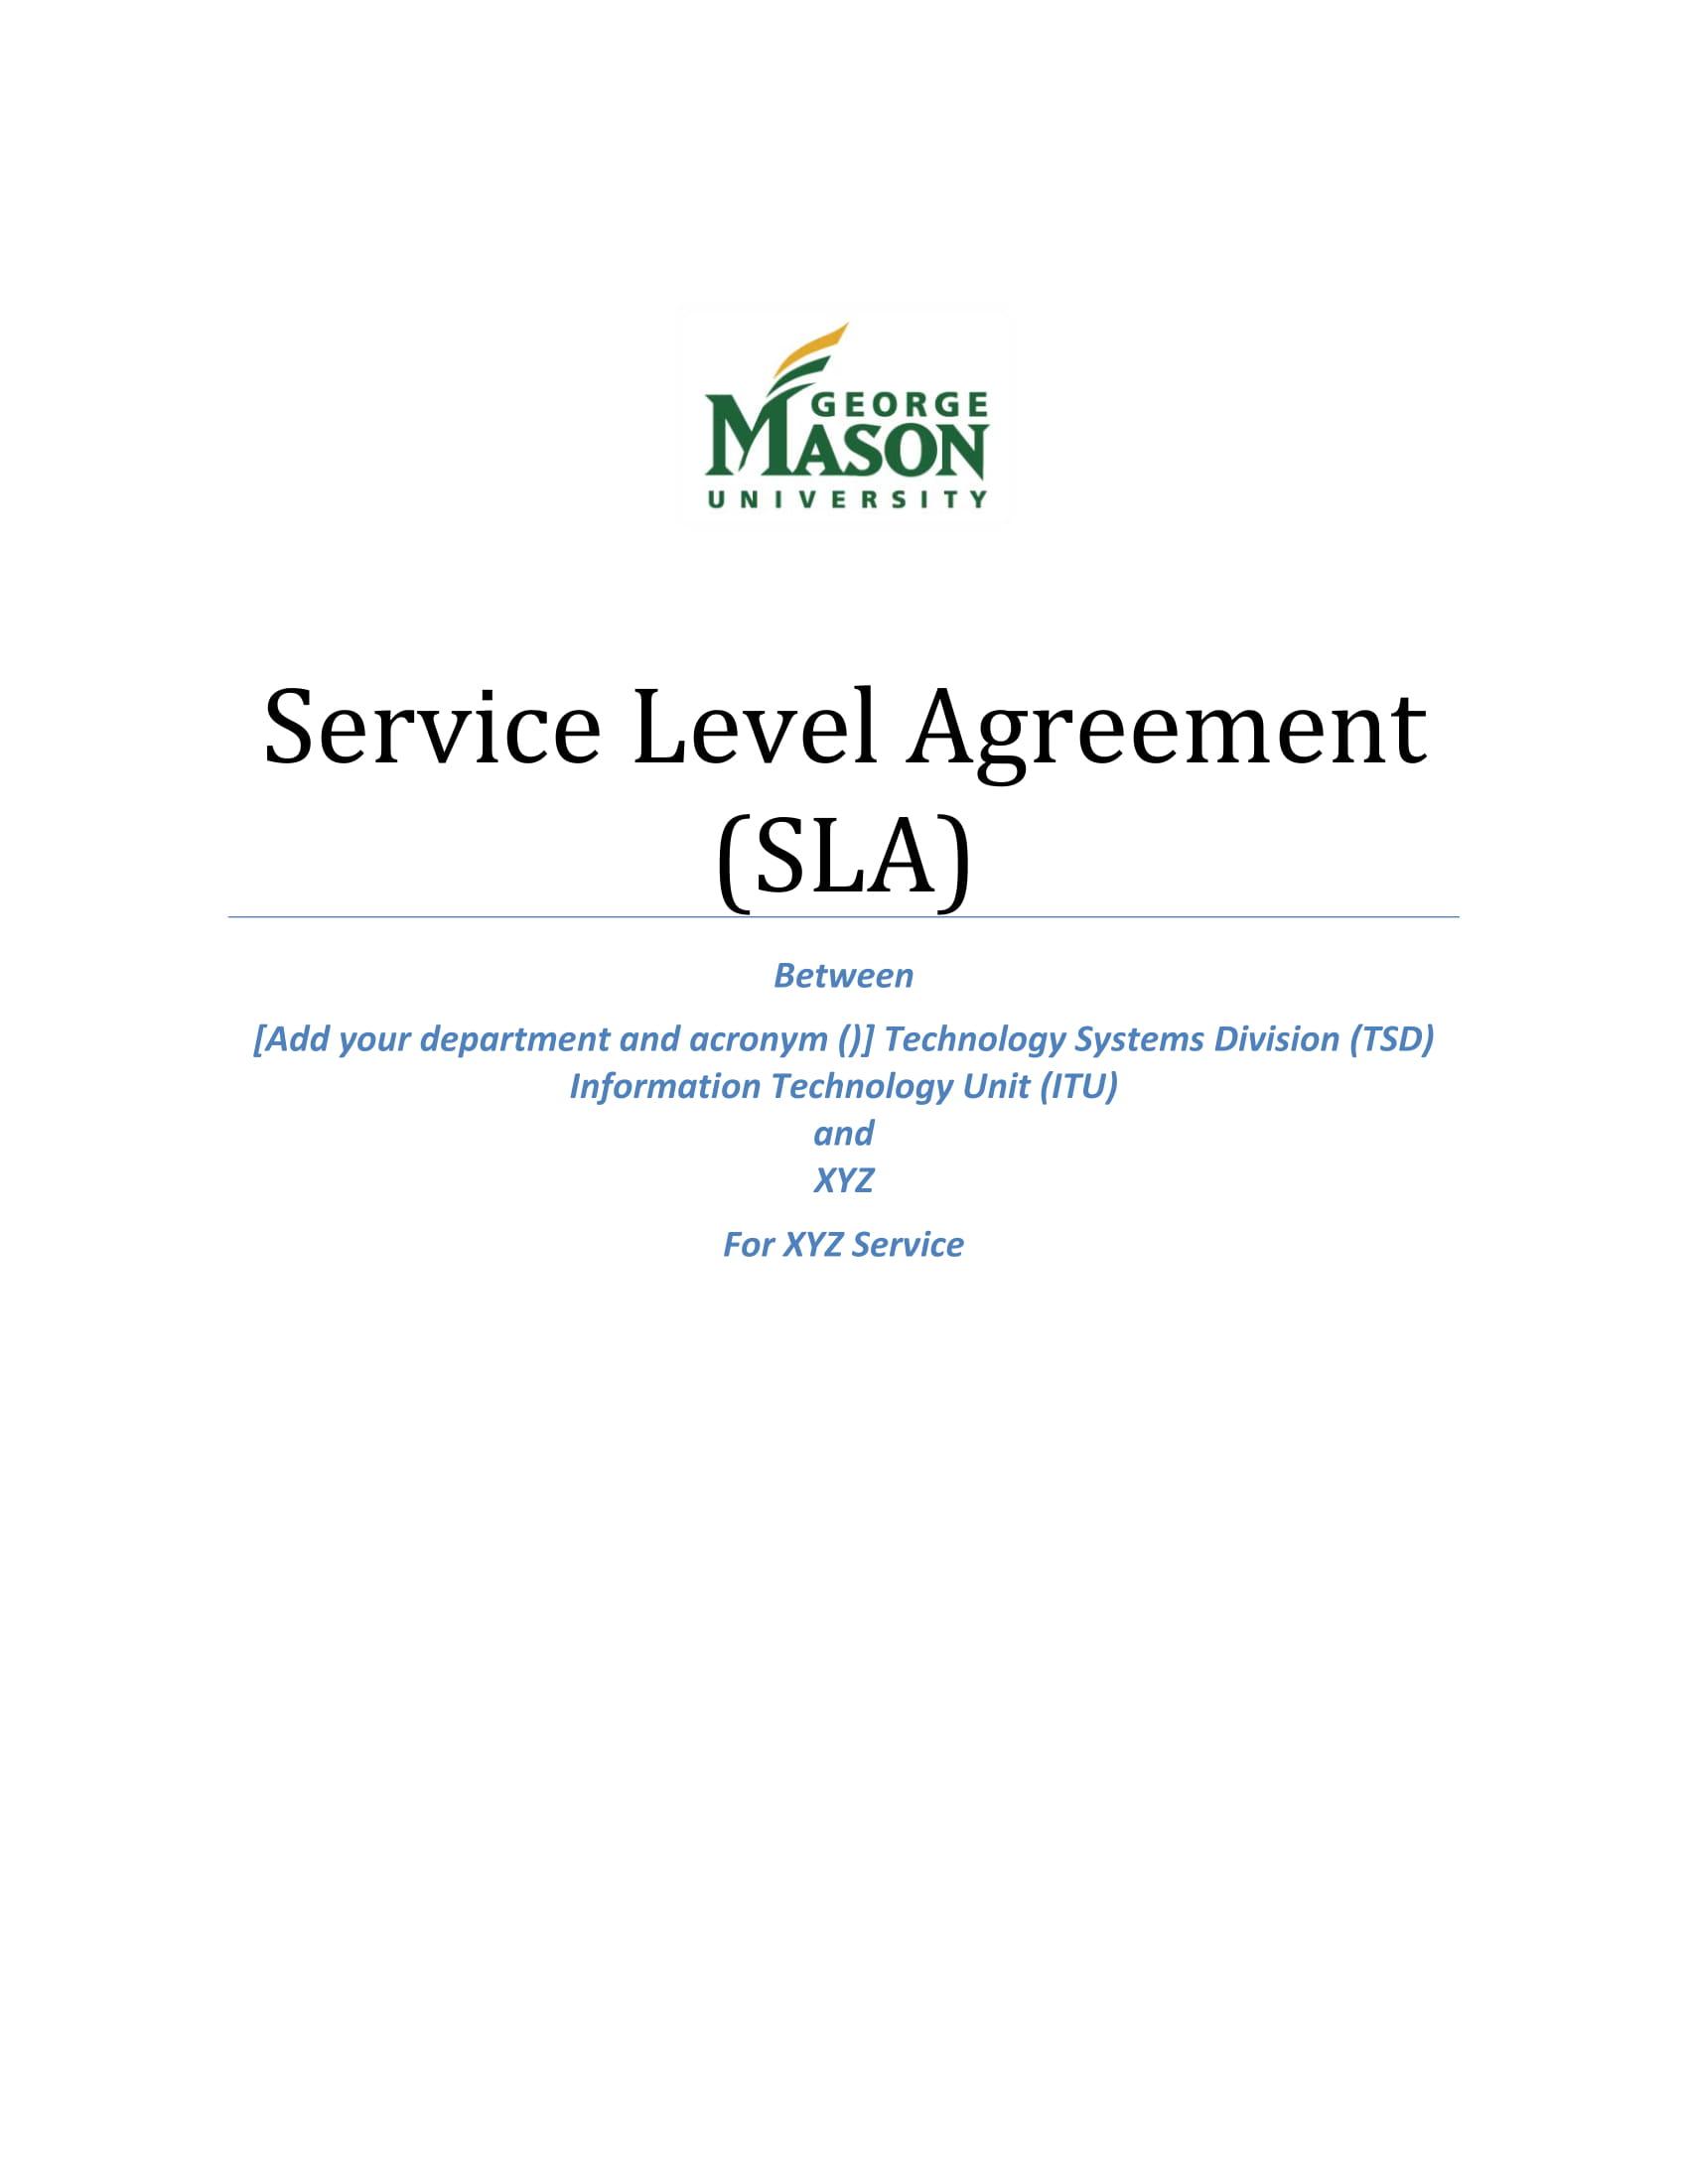 service level agreement sla example 01